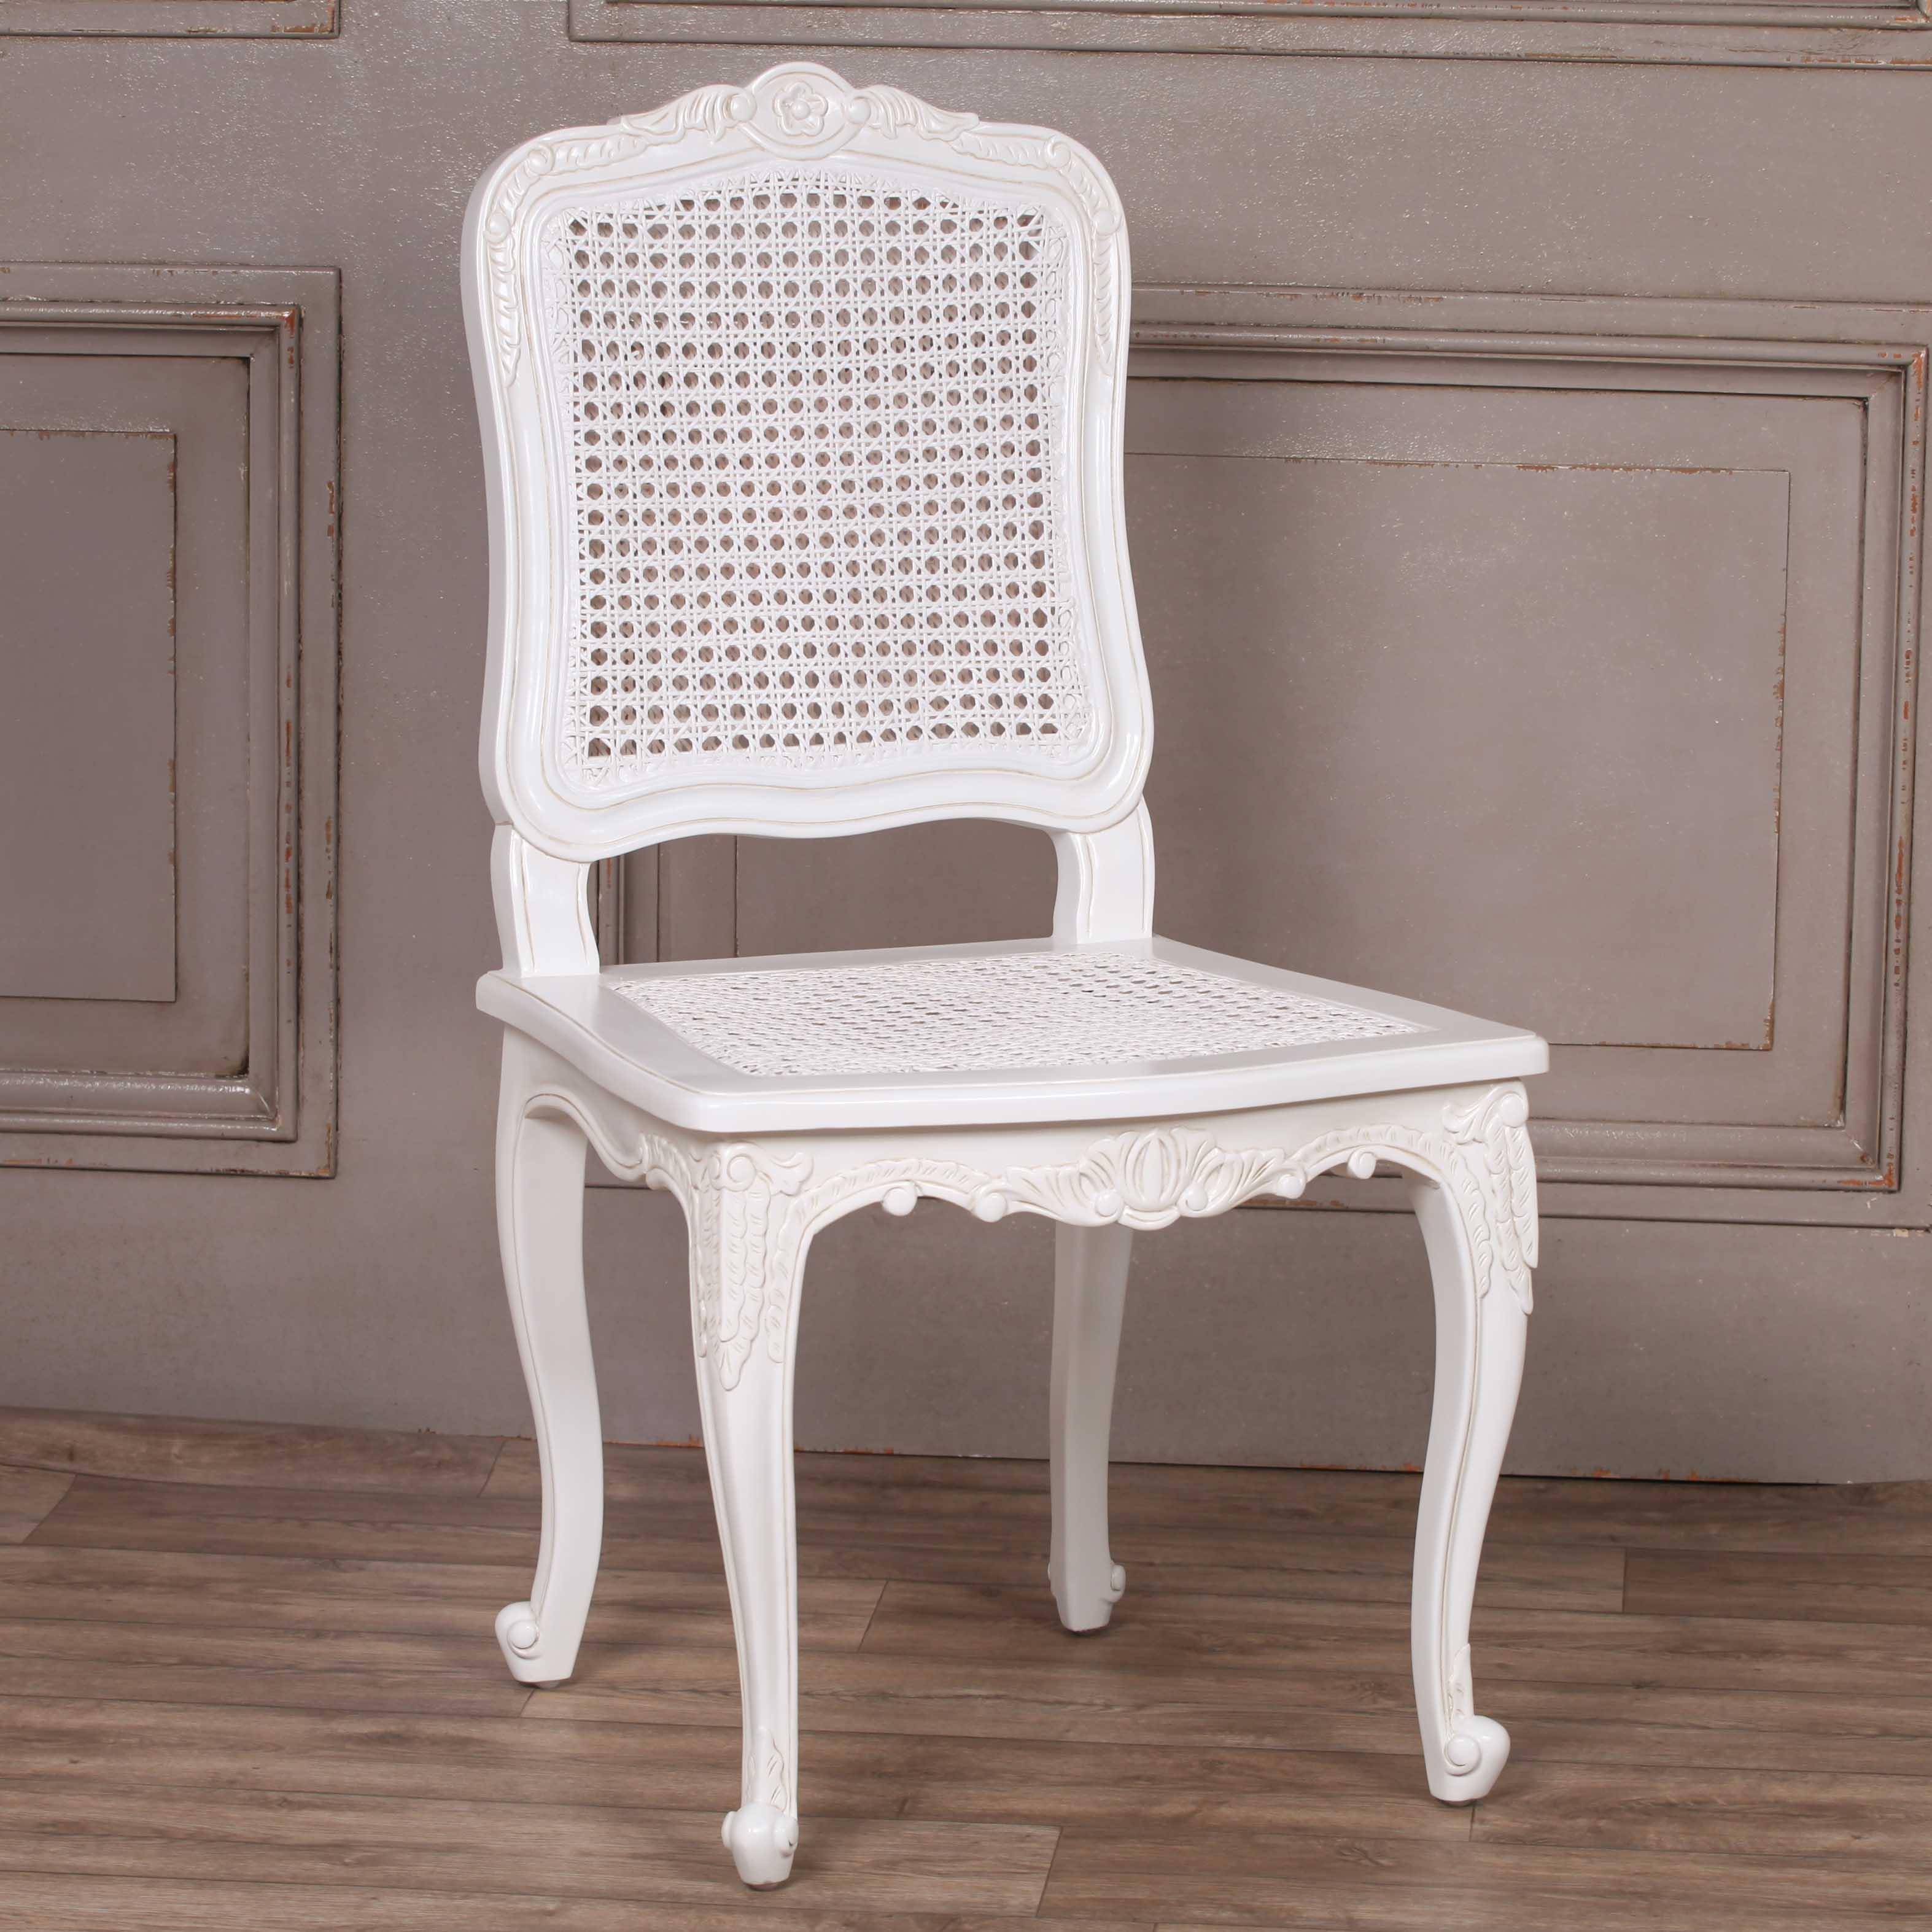 French Provencal White Rattan Chair Furniture La Maison Chic Luxury Interiors